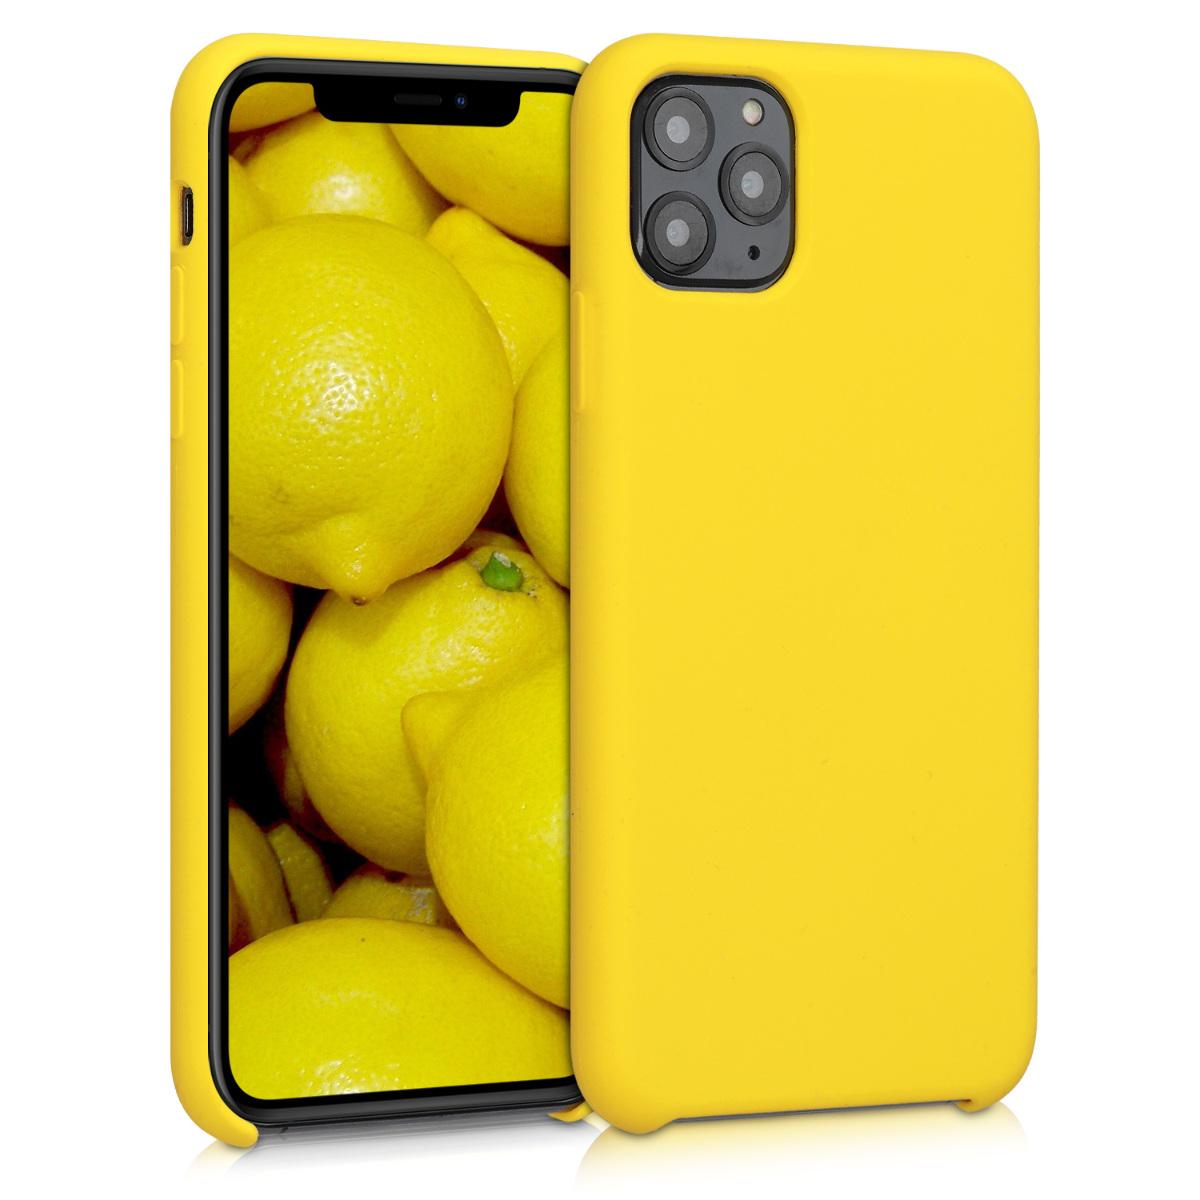 KW Θήκη Σιλικόνης Apple iPhone 11 Pro Max - Soft Flexible Rubber - Vibrant Yellow (49725.165)